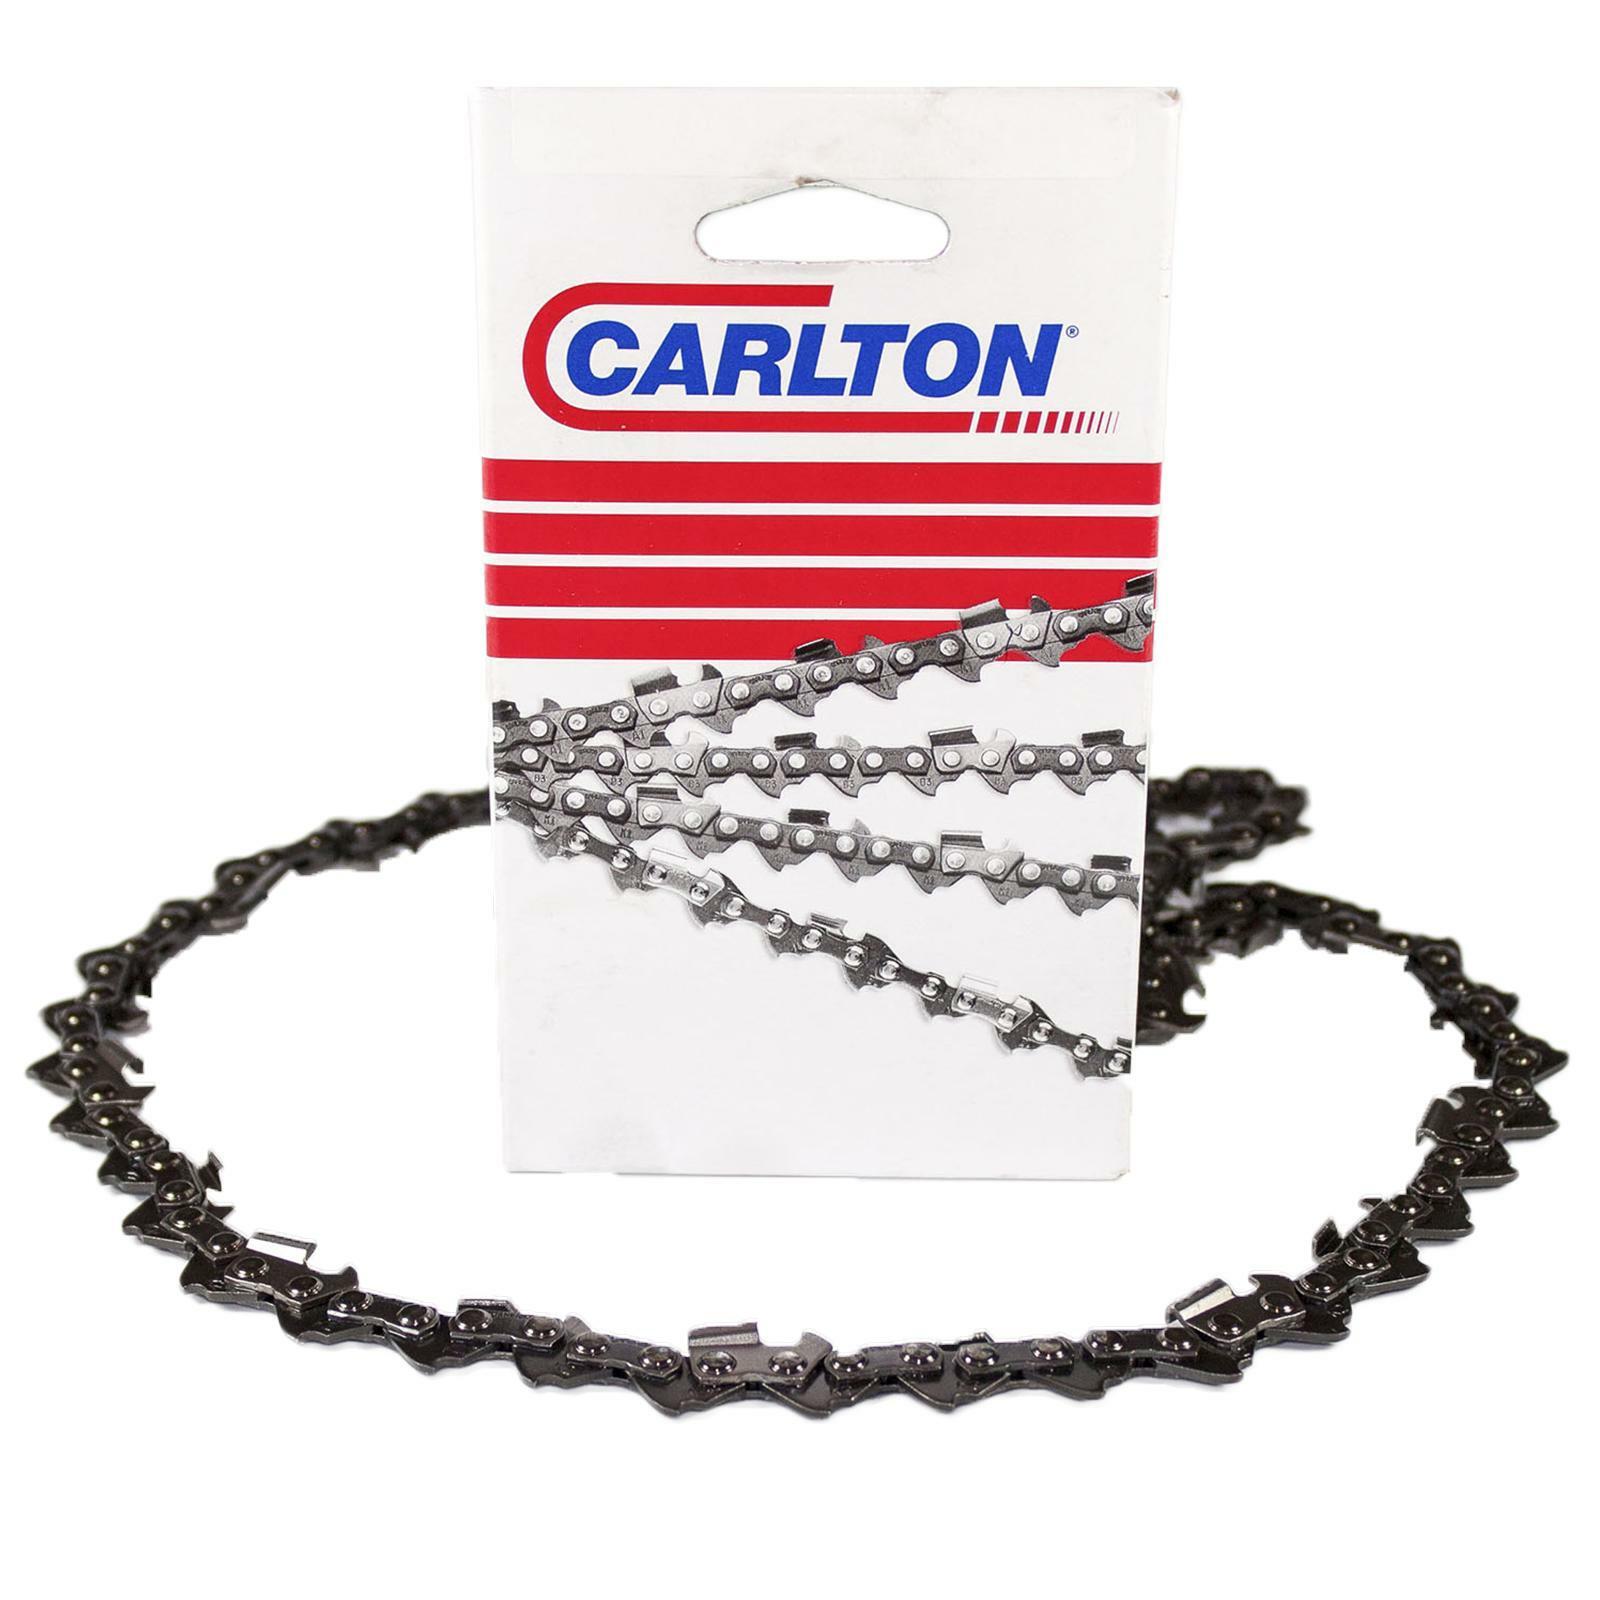 carlton catena per motosega carlton 3/8 sp 1.3 cm 45 60 maglie